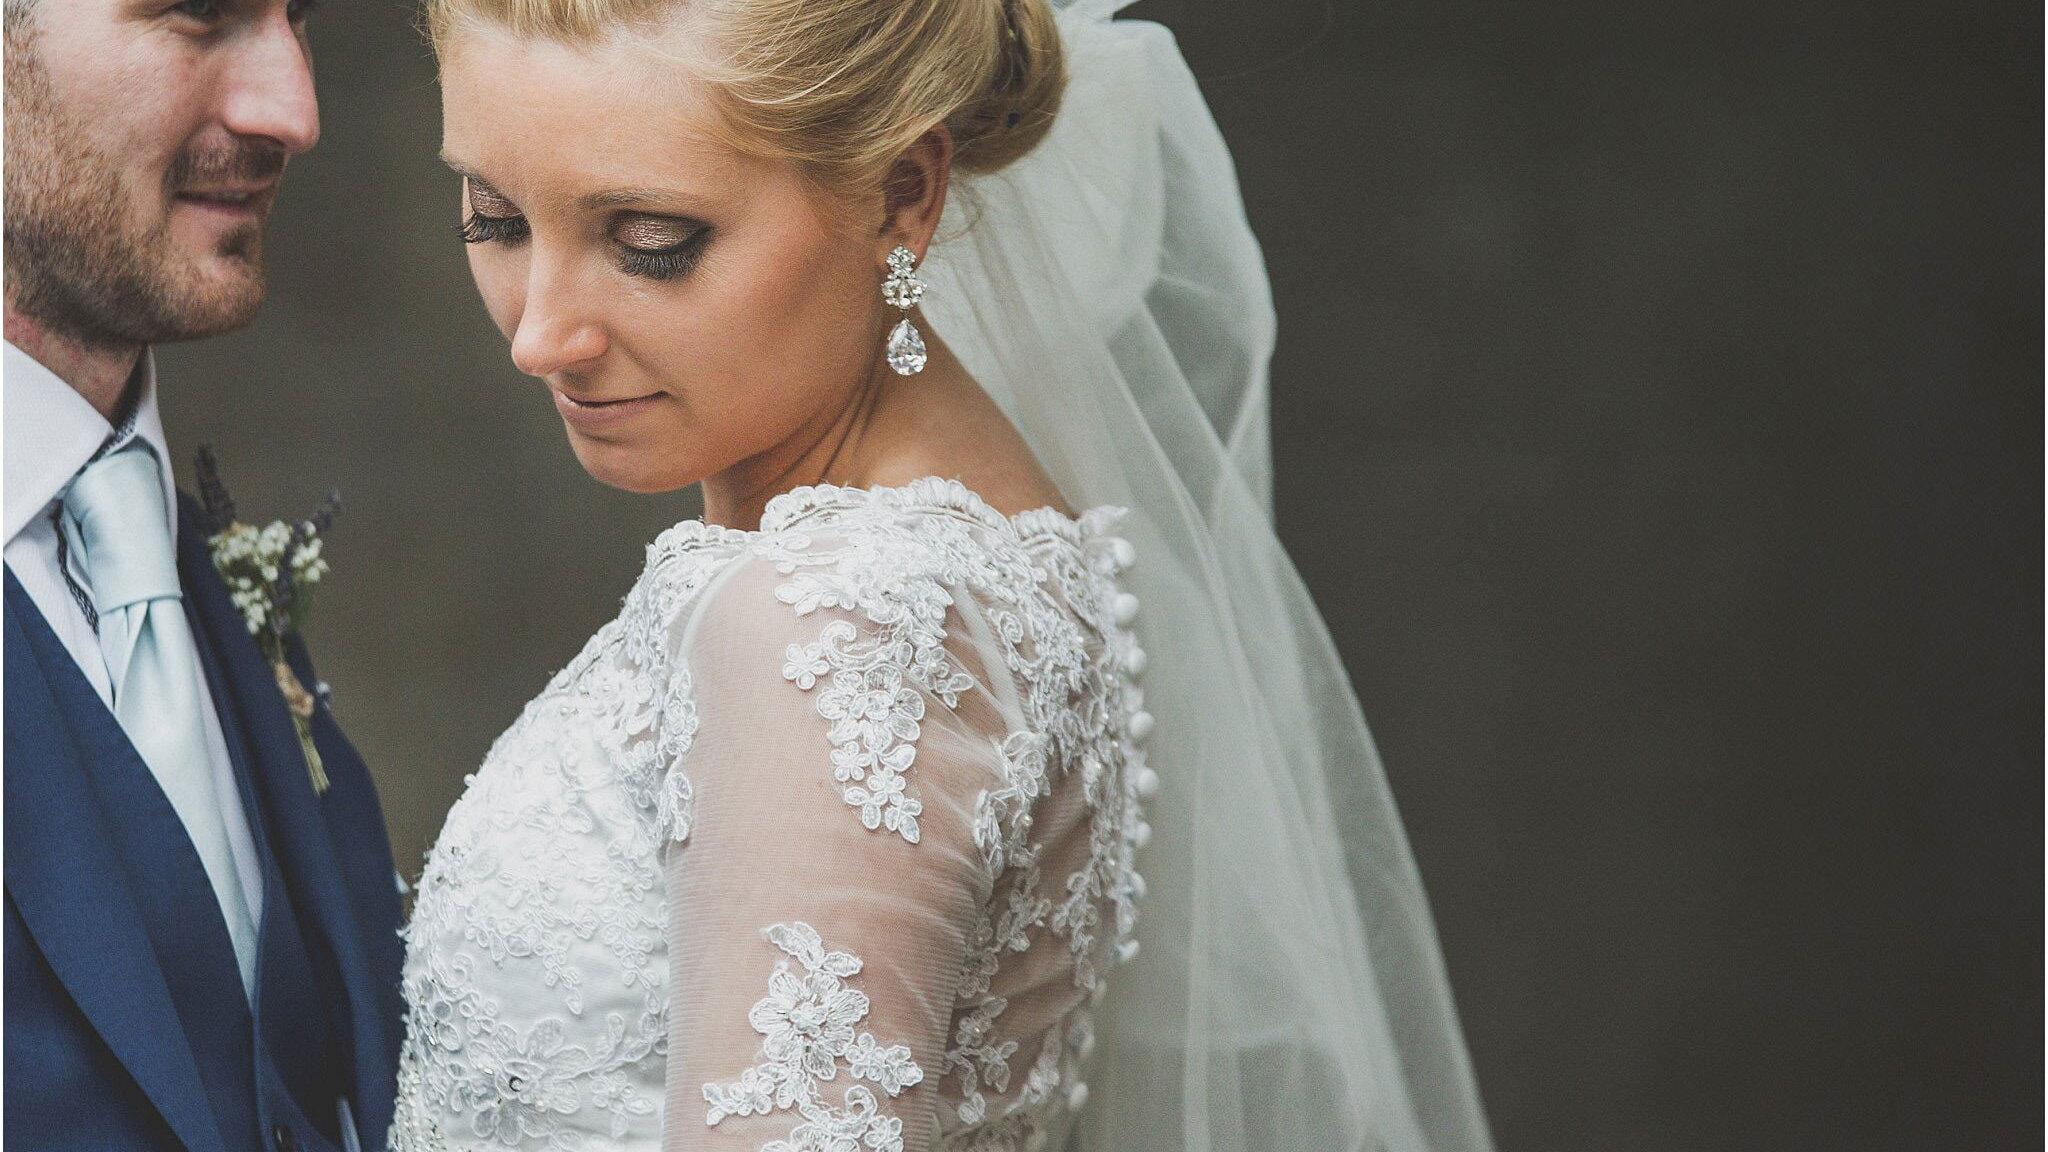 Hereford wedding photographers Herefordshire